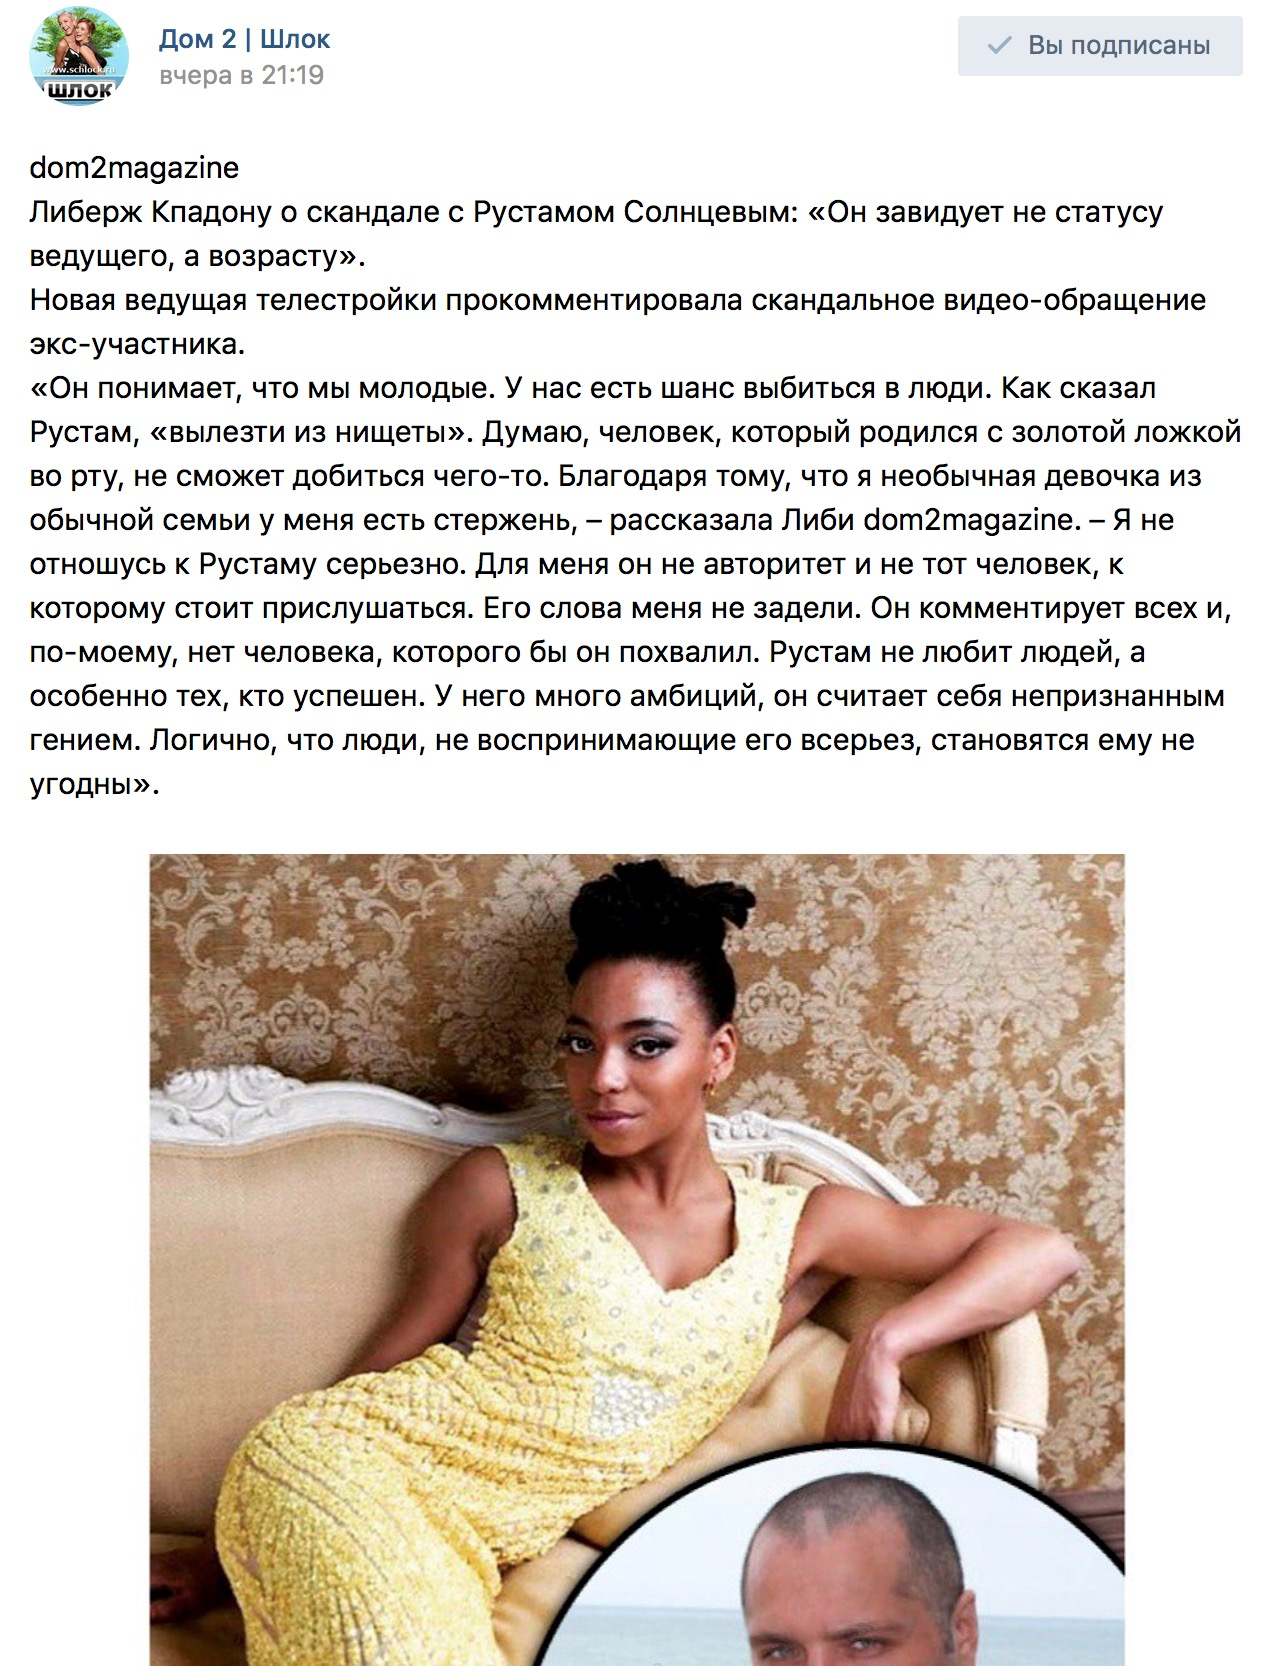 Либерж Кпадону о скандале с Рустамом Солнцевым